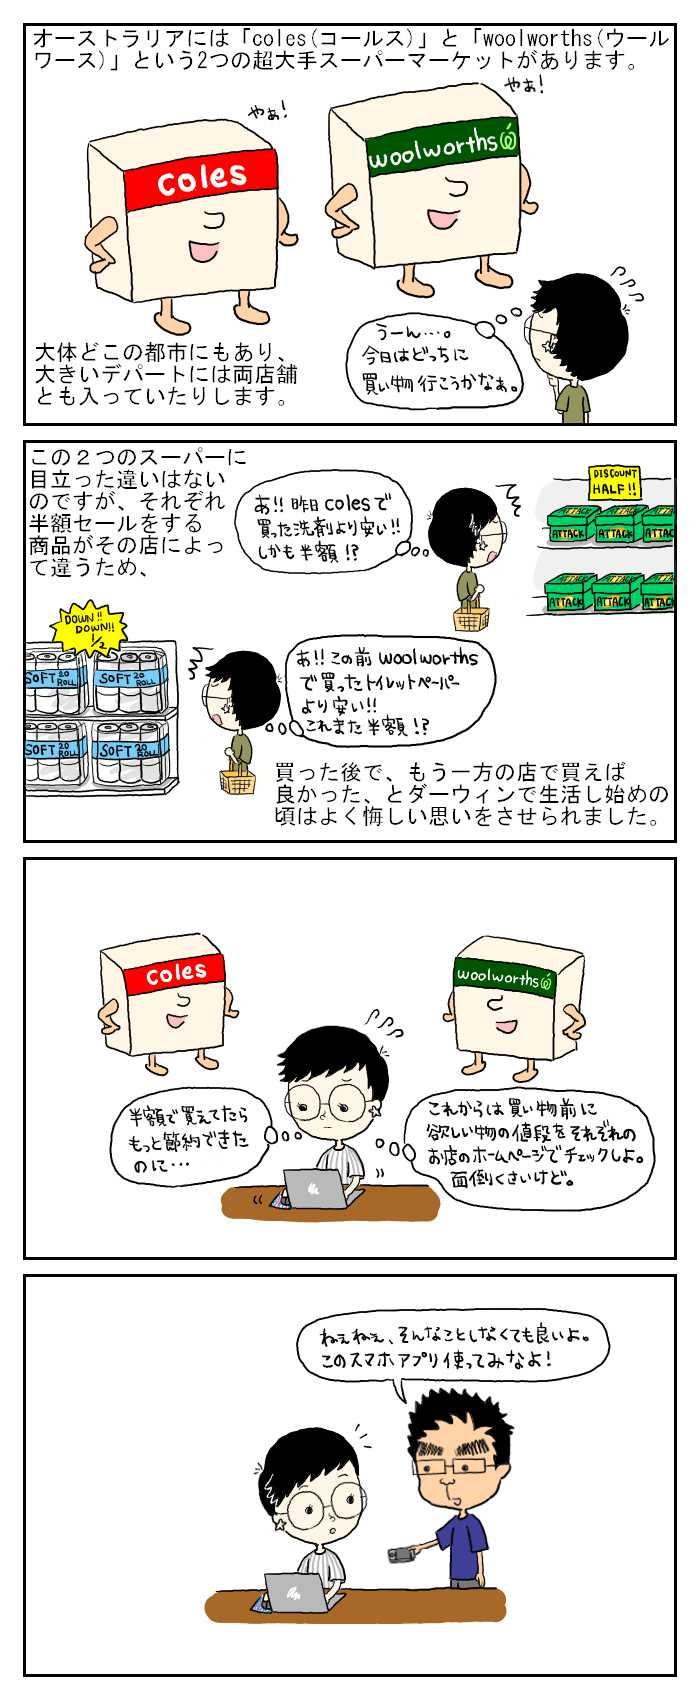 77_Useful App_jp_1